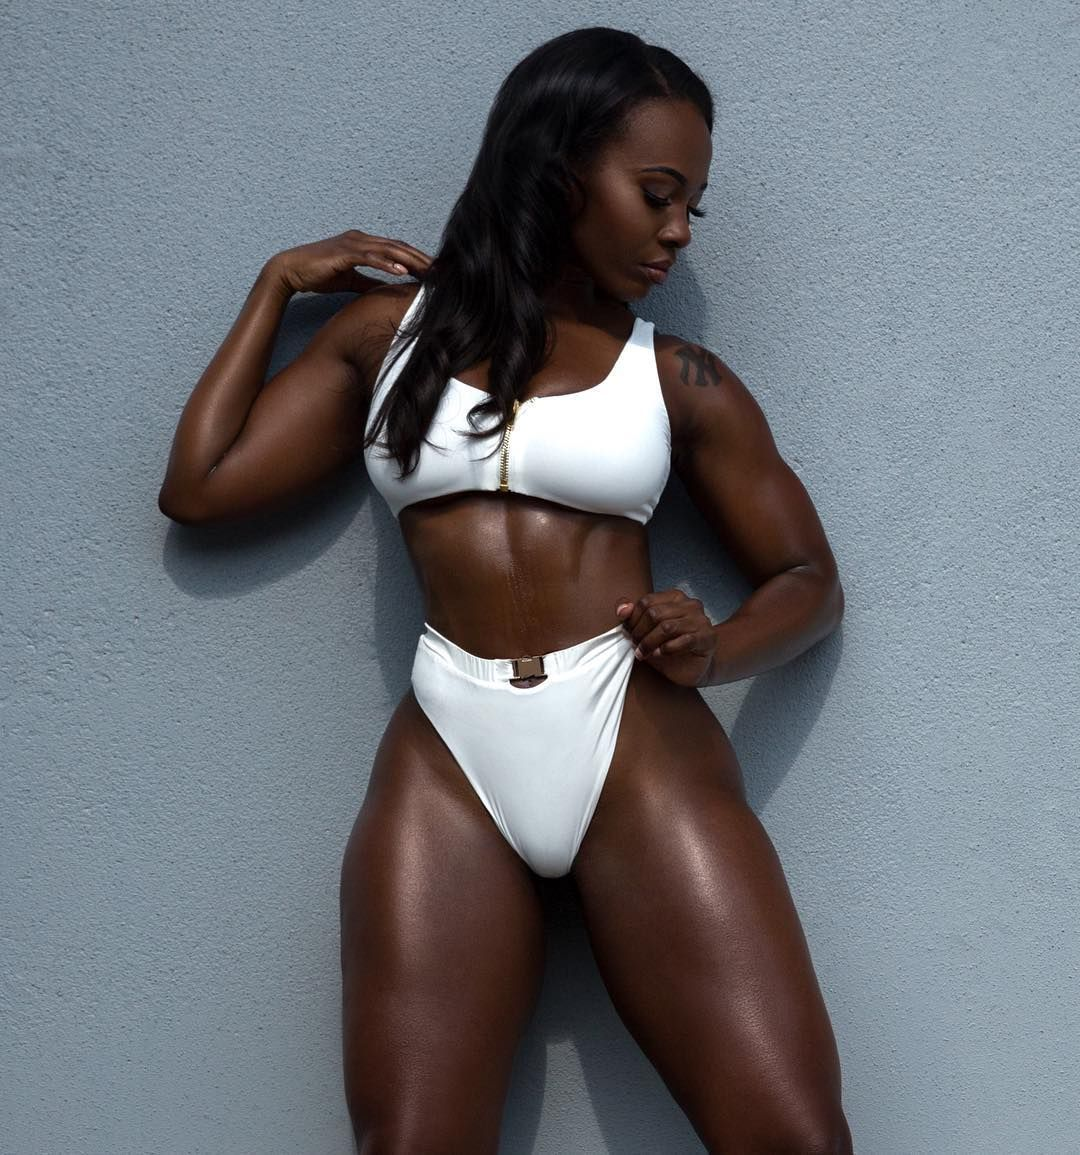 Pin By Samurai James On Vestidos Black Beauty Tumblr Fitness Inspiration Body Dark Skin Women